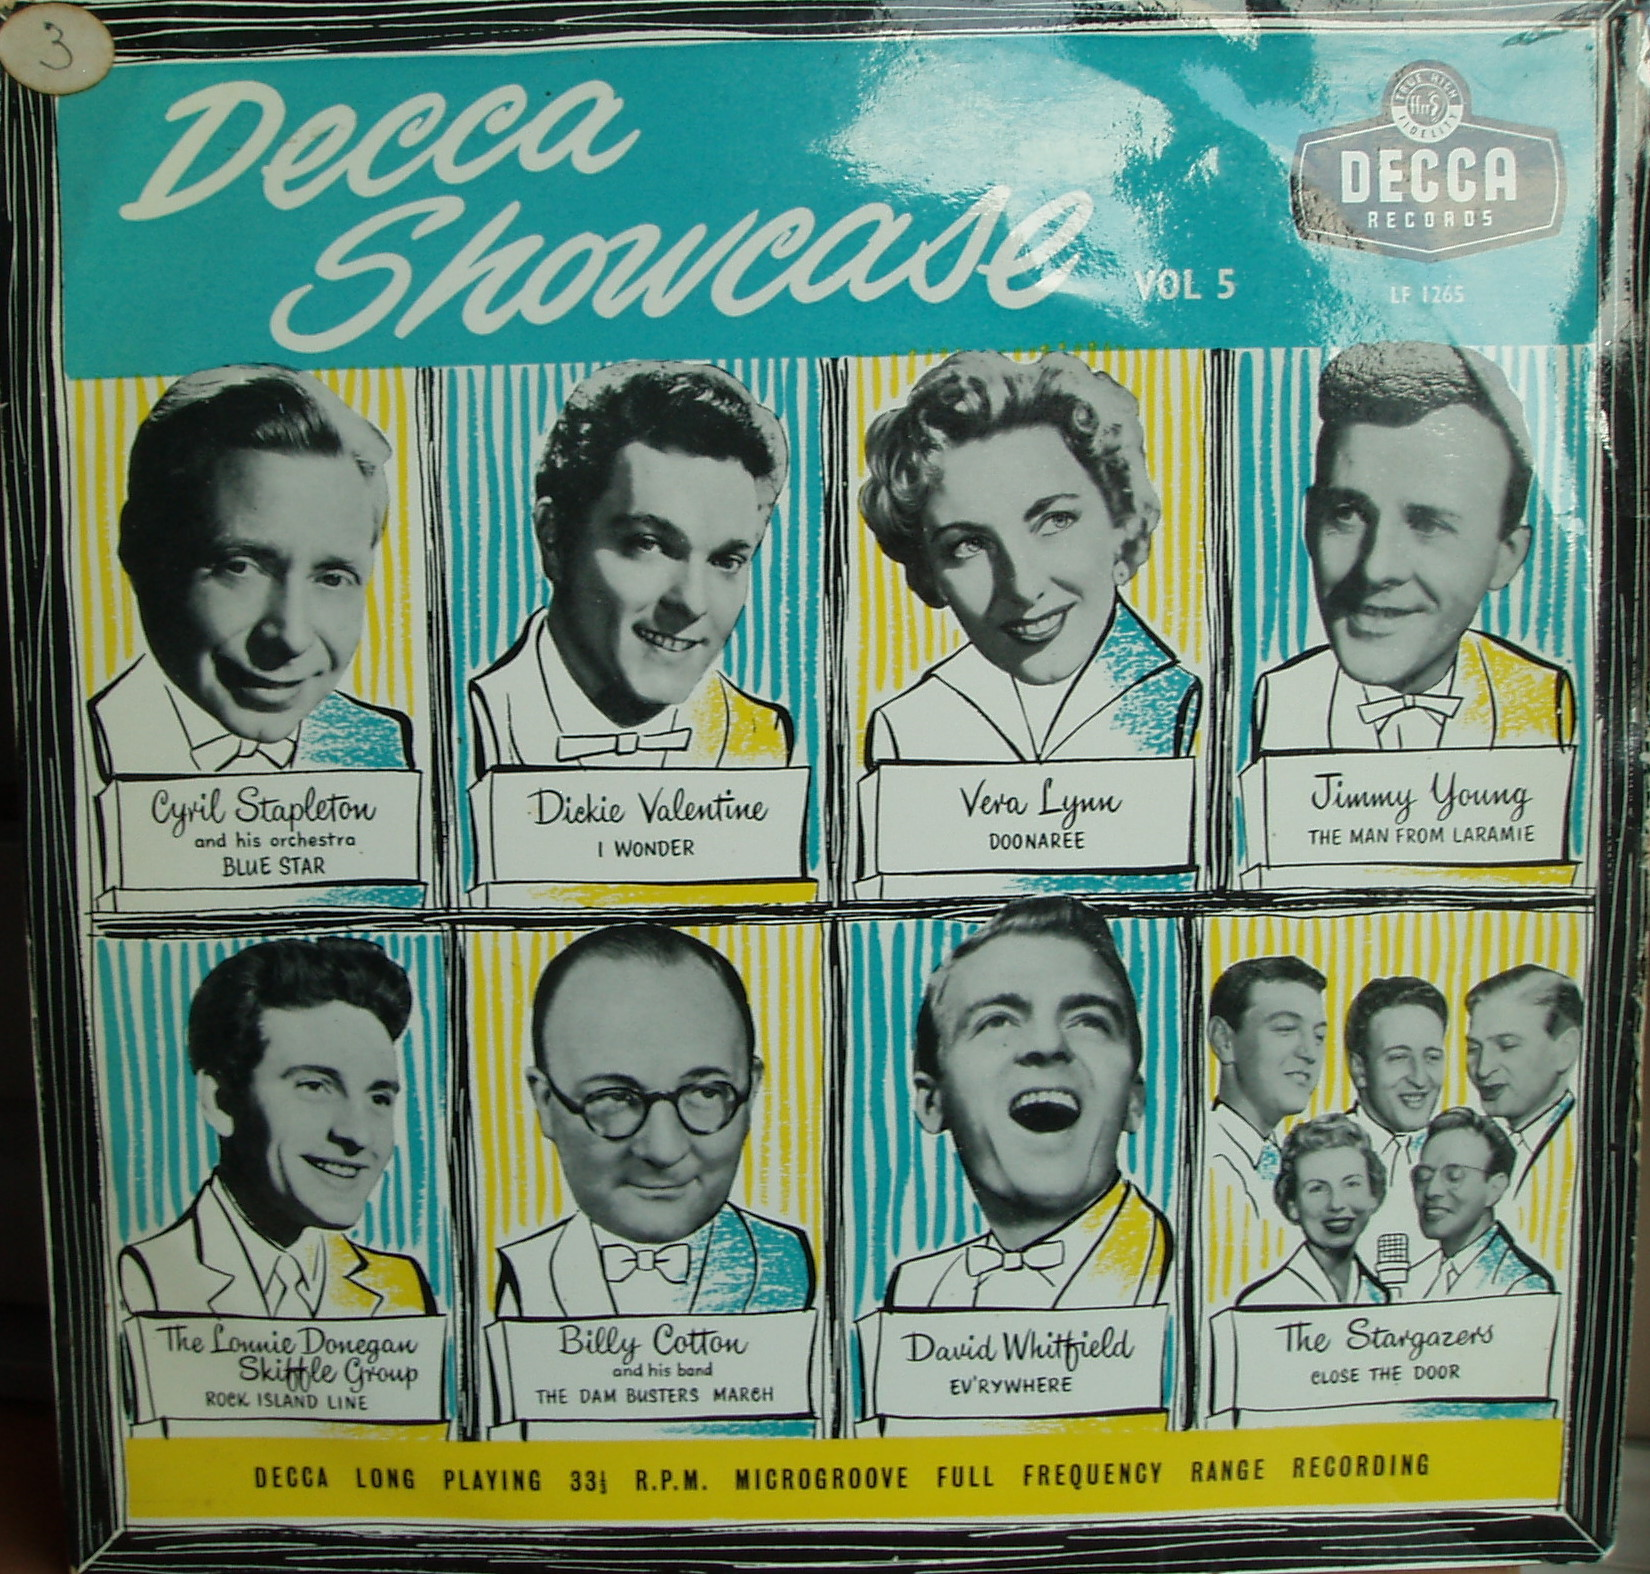 Decca Showcase